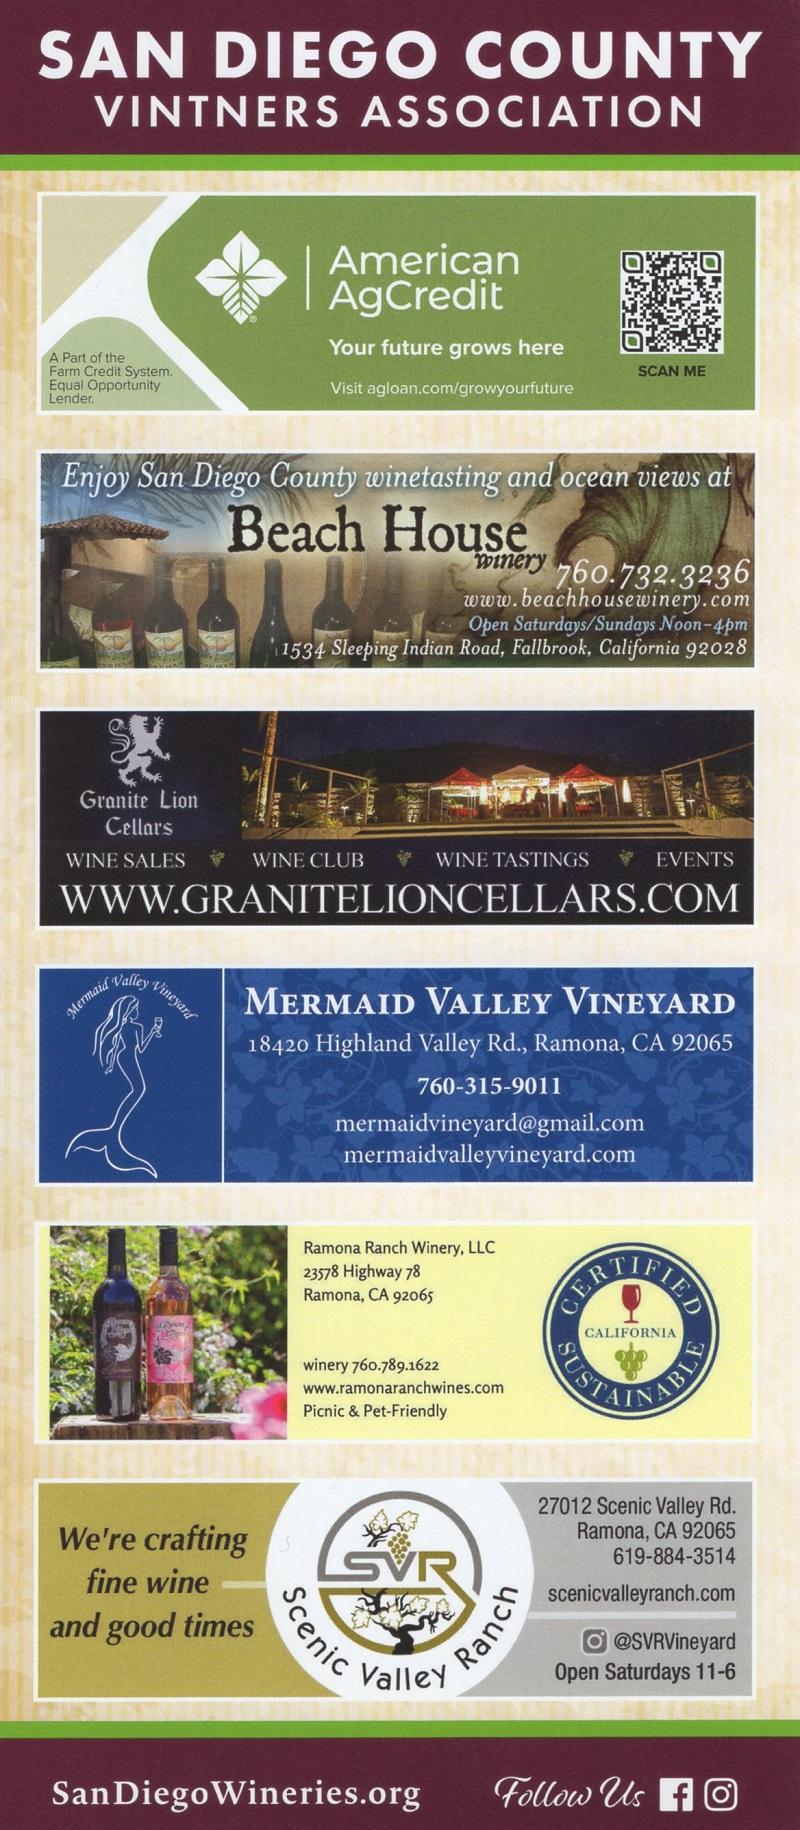 San Diego County Vintners Assn brochure thumbnail